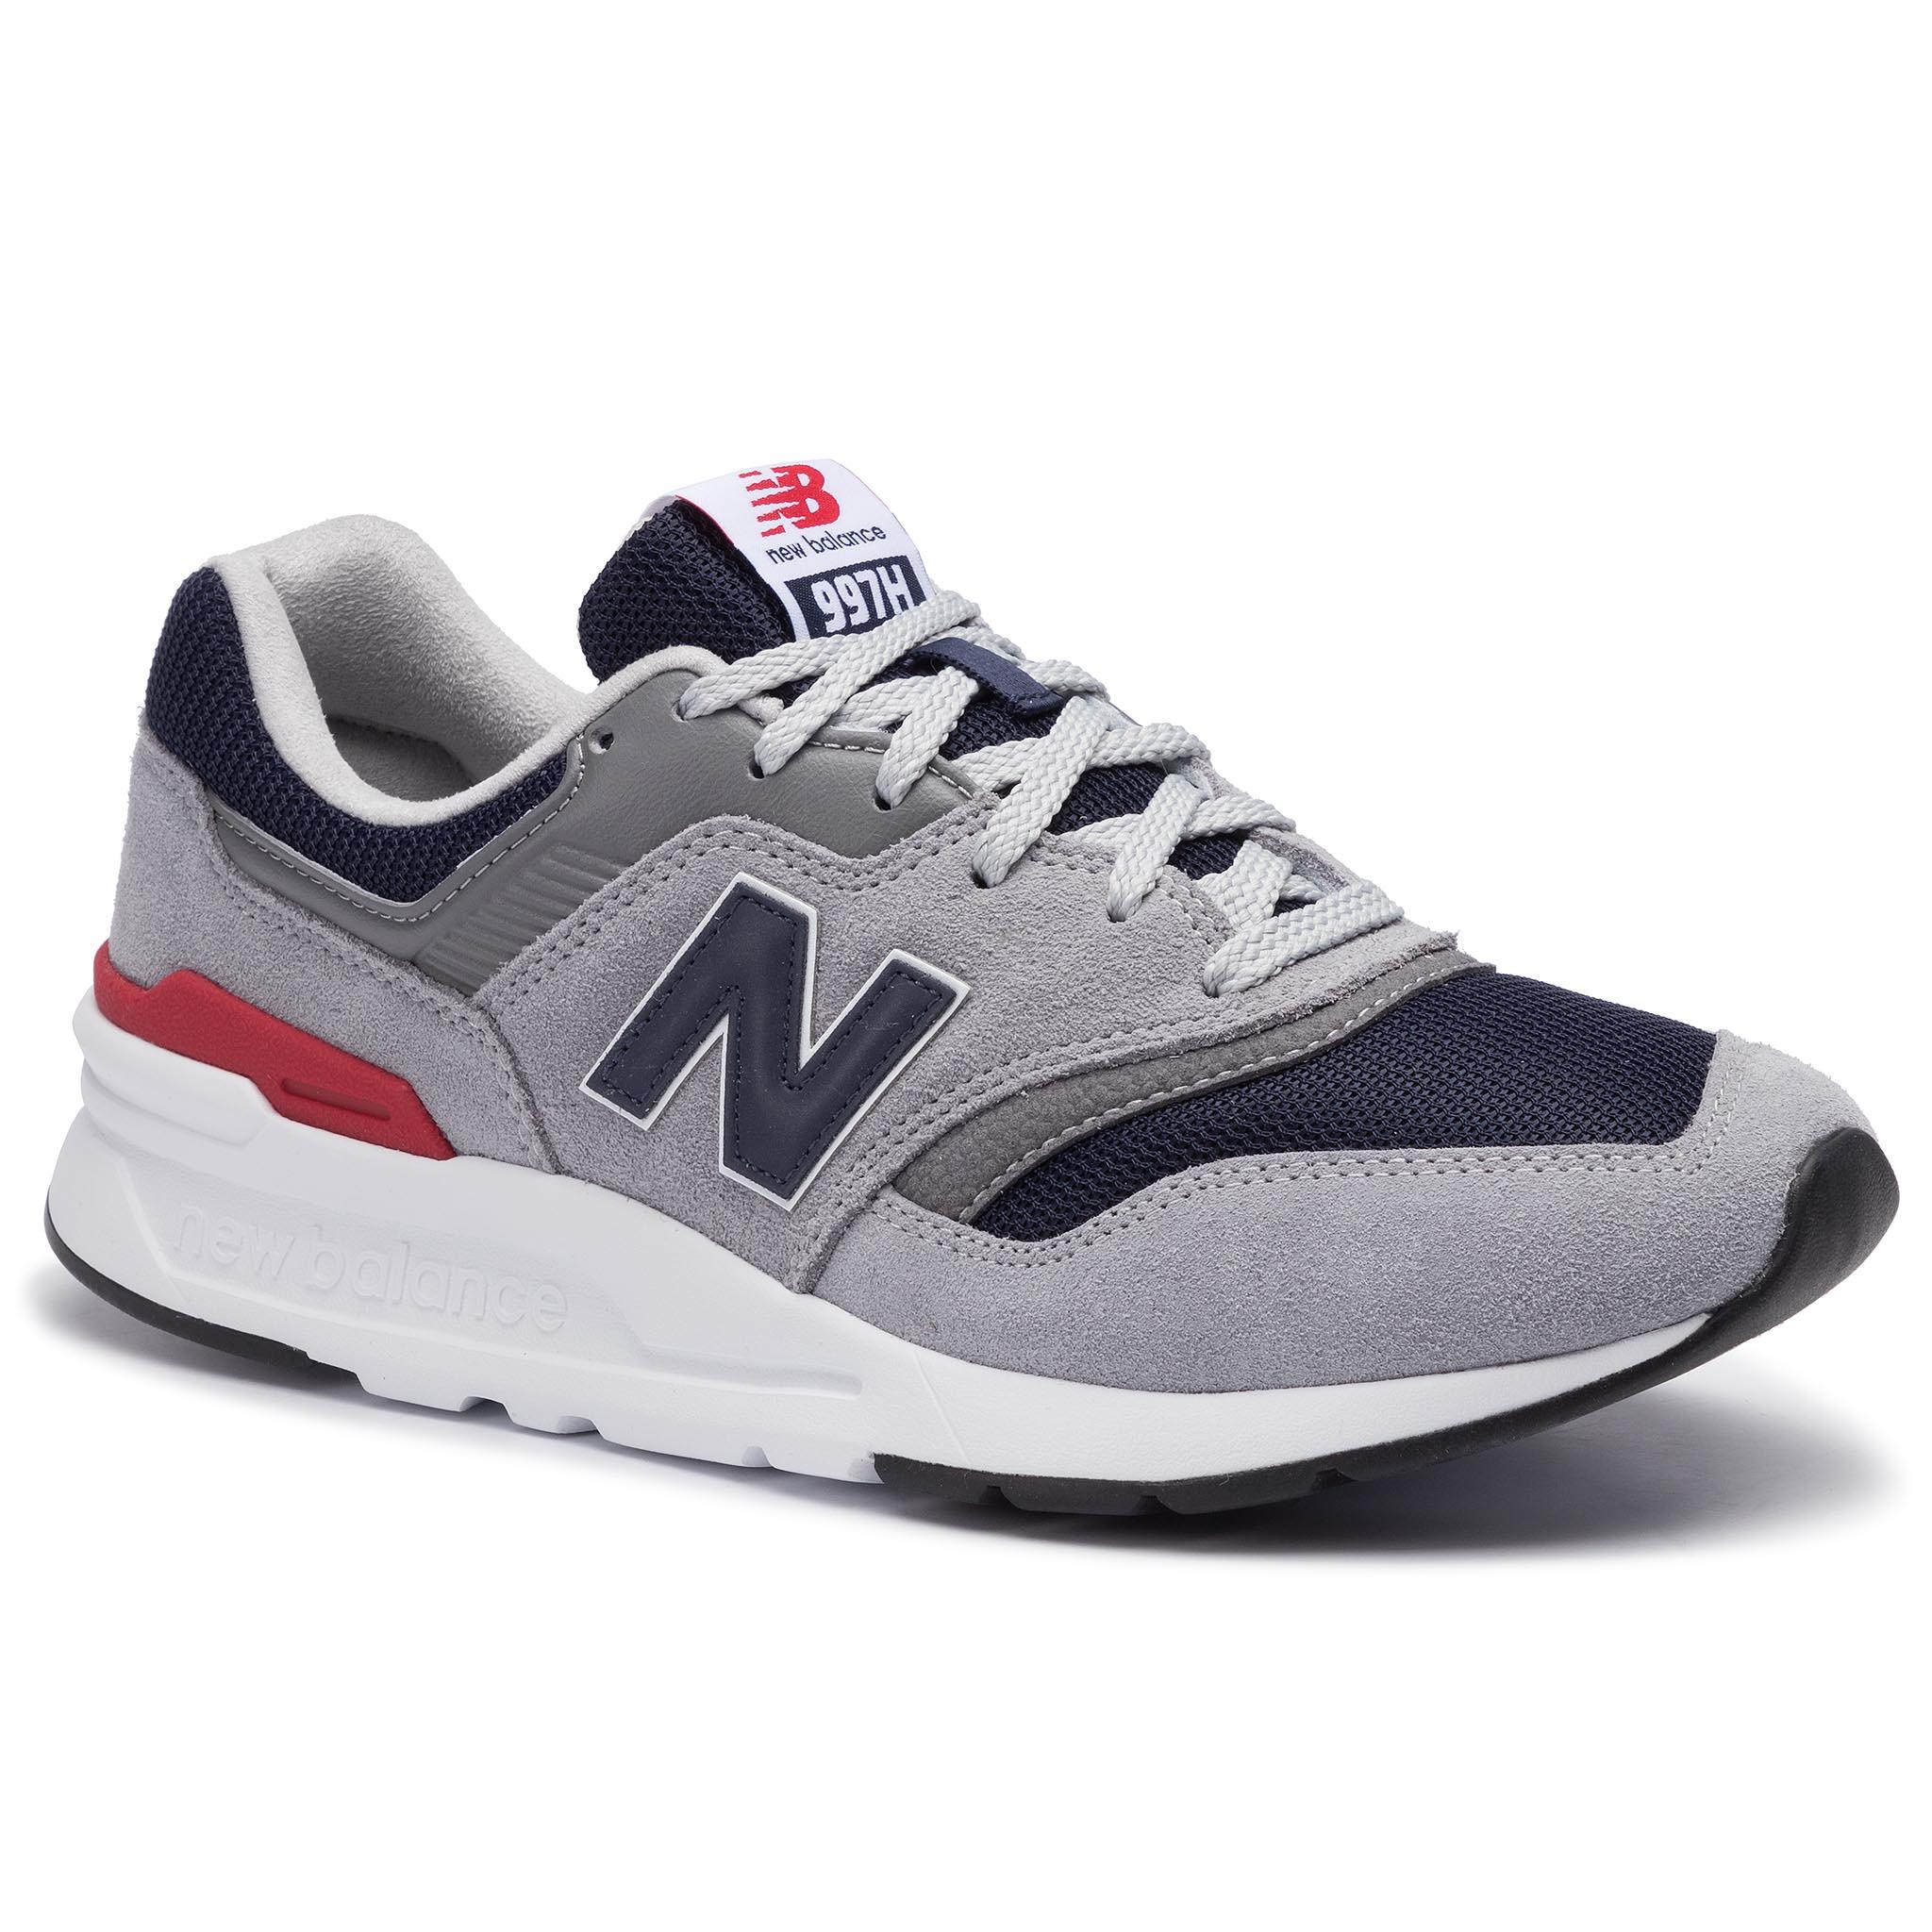 Gris New Balance Zapatillas Zapatillas NM288(TRI) para